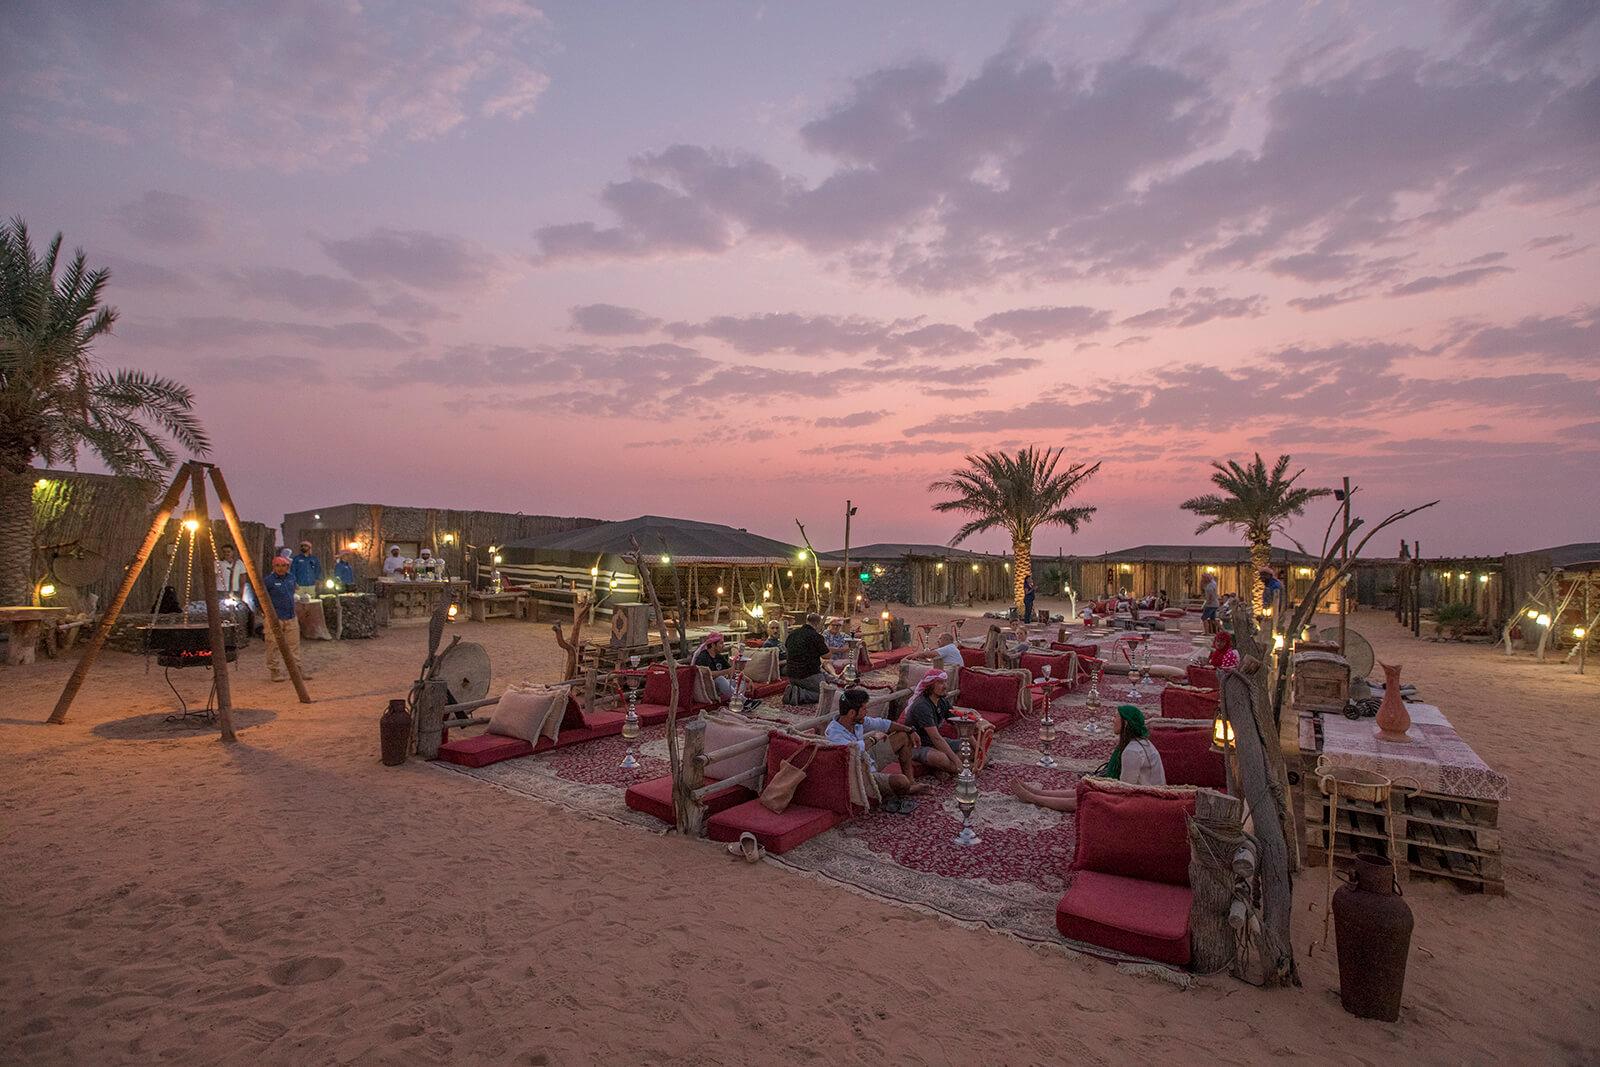 Desert Safaris that Make a Positive Difference in Dubai